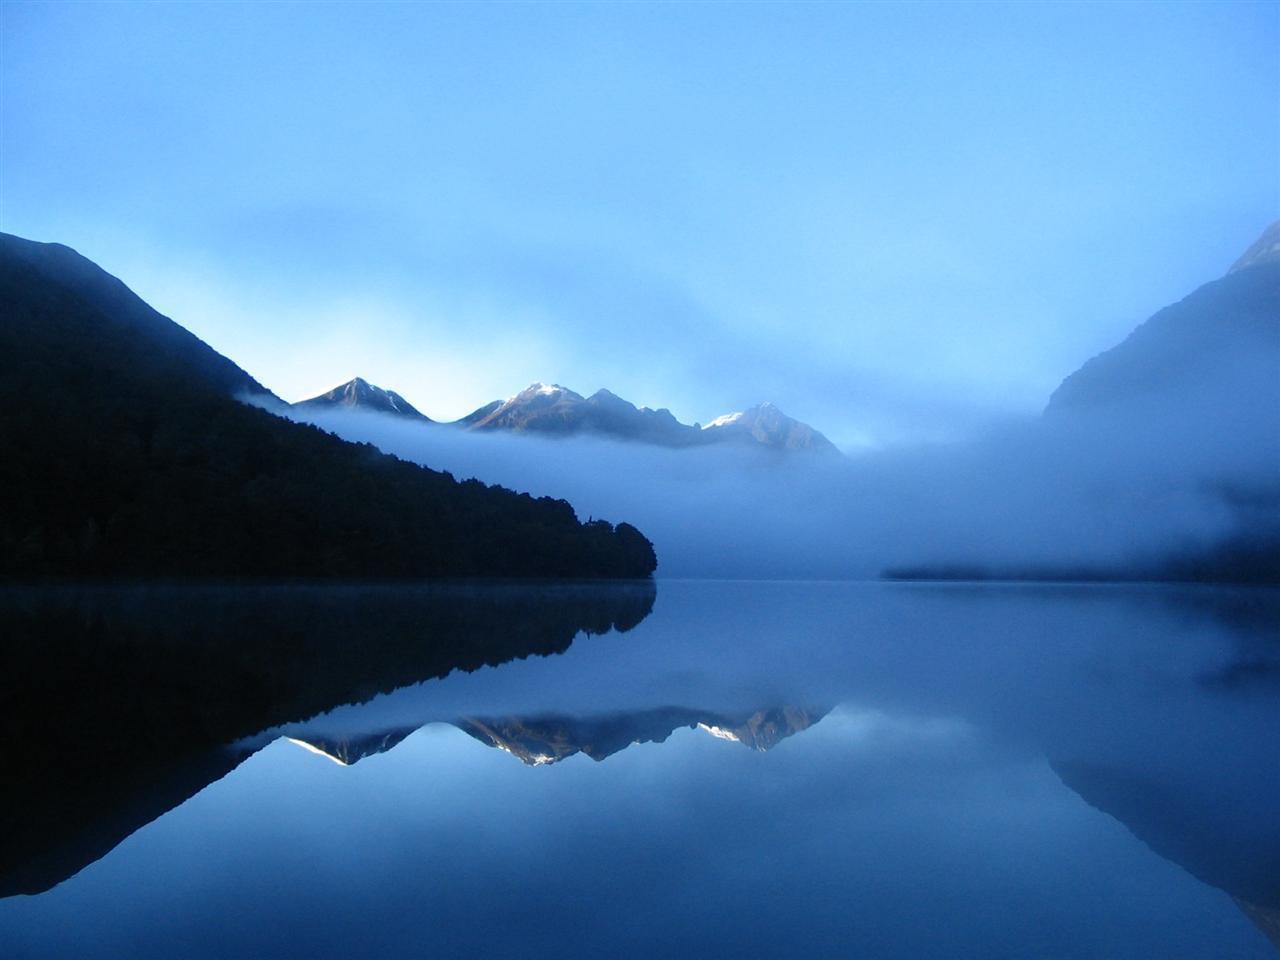 Fondos De Pantalla De Quikis: New Zealand Desktop Wallpapers